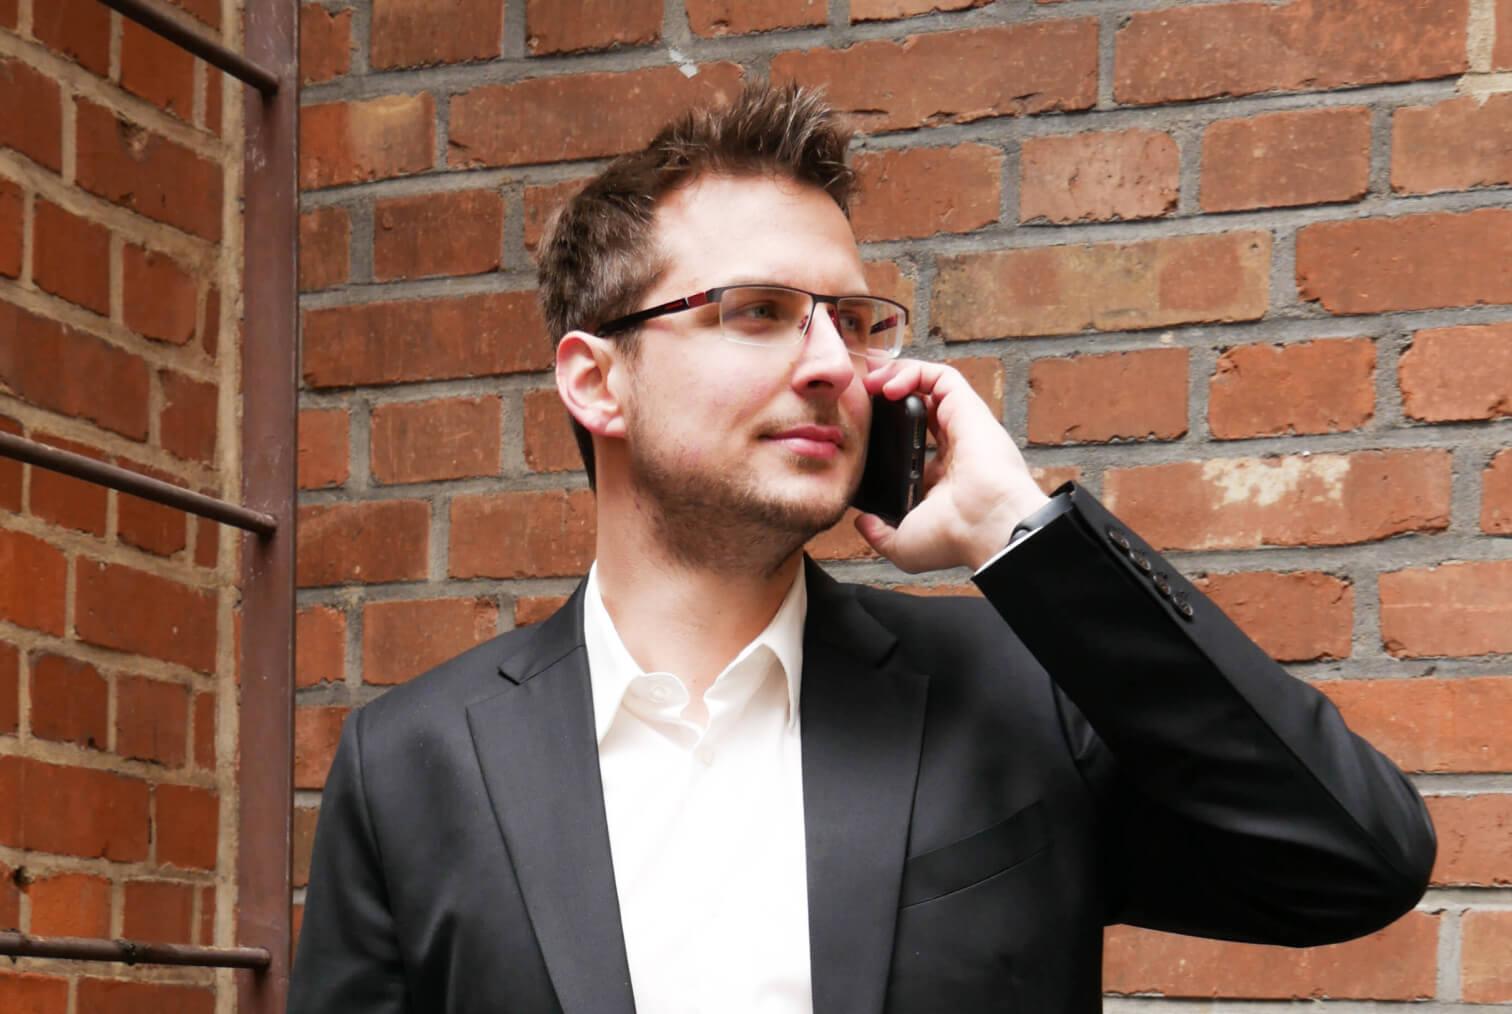 Image of Tobias Bäumler